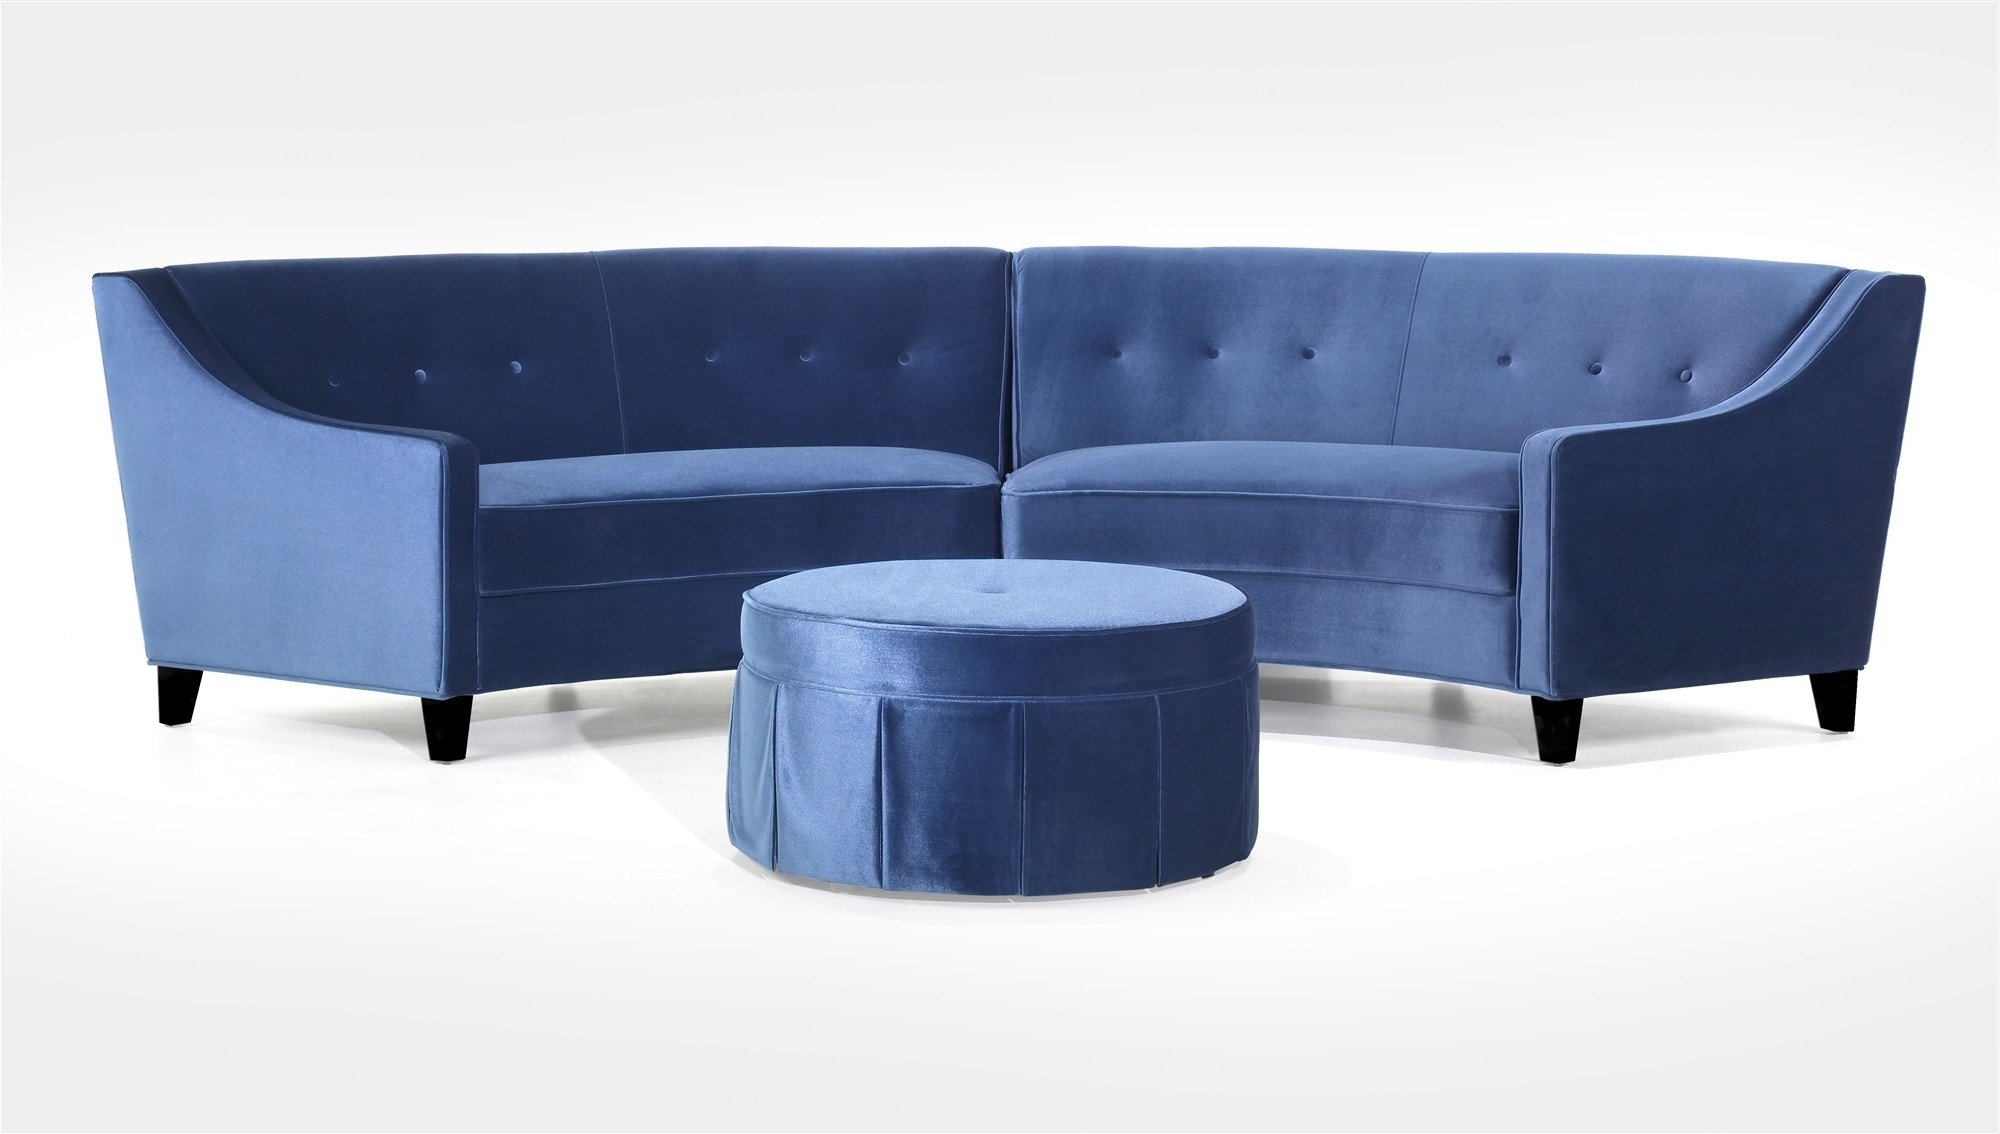 Fashionable Sectional Sofas Atlanta – Cleanupflorida In Sectional Sofas In Atlanta (View 12 of 20)